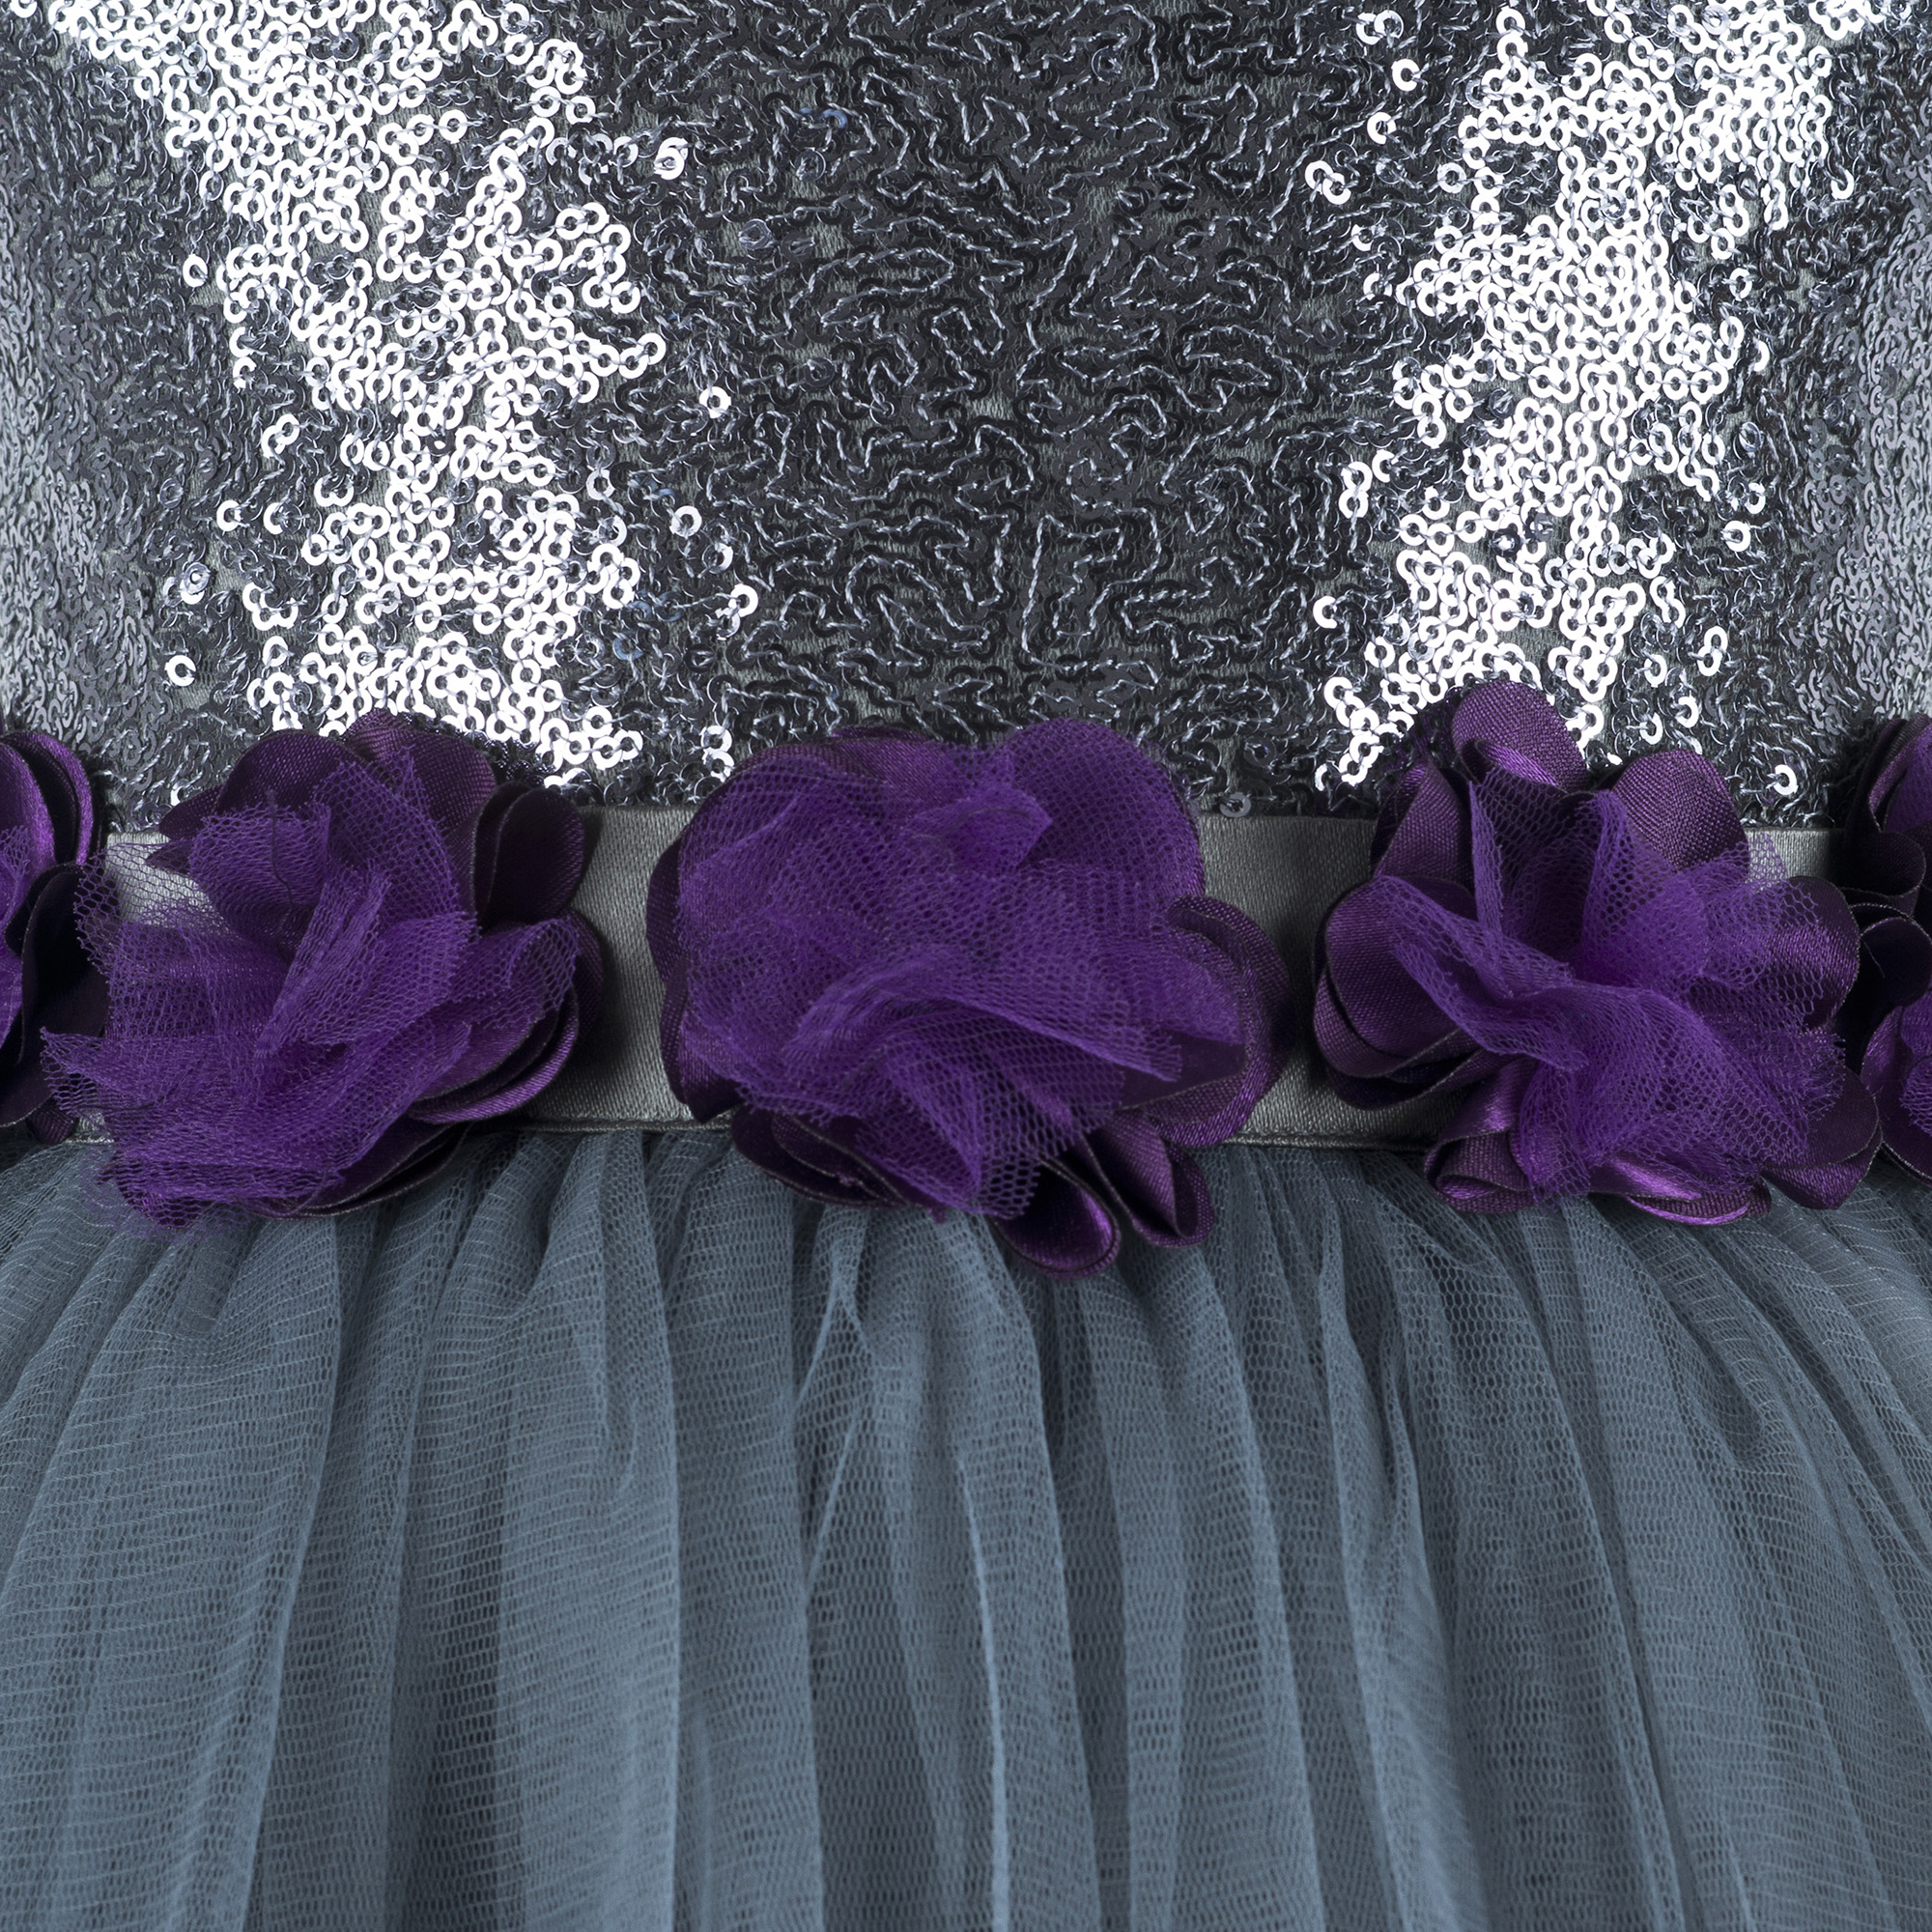 Sequins Embellished Grey Knee Length Party Frock